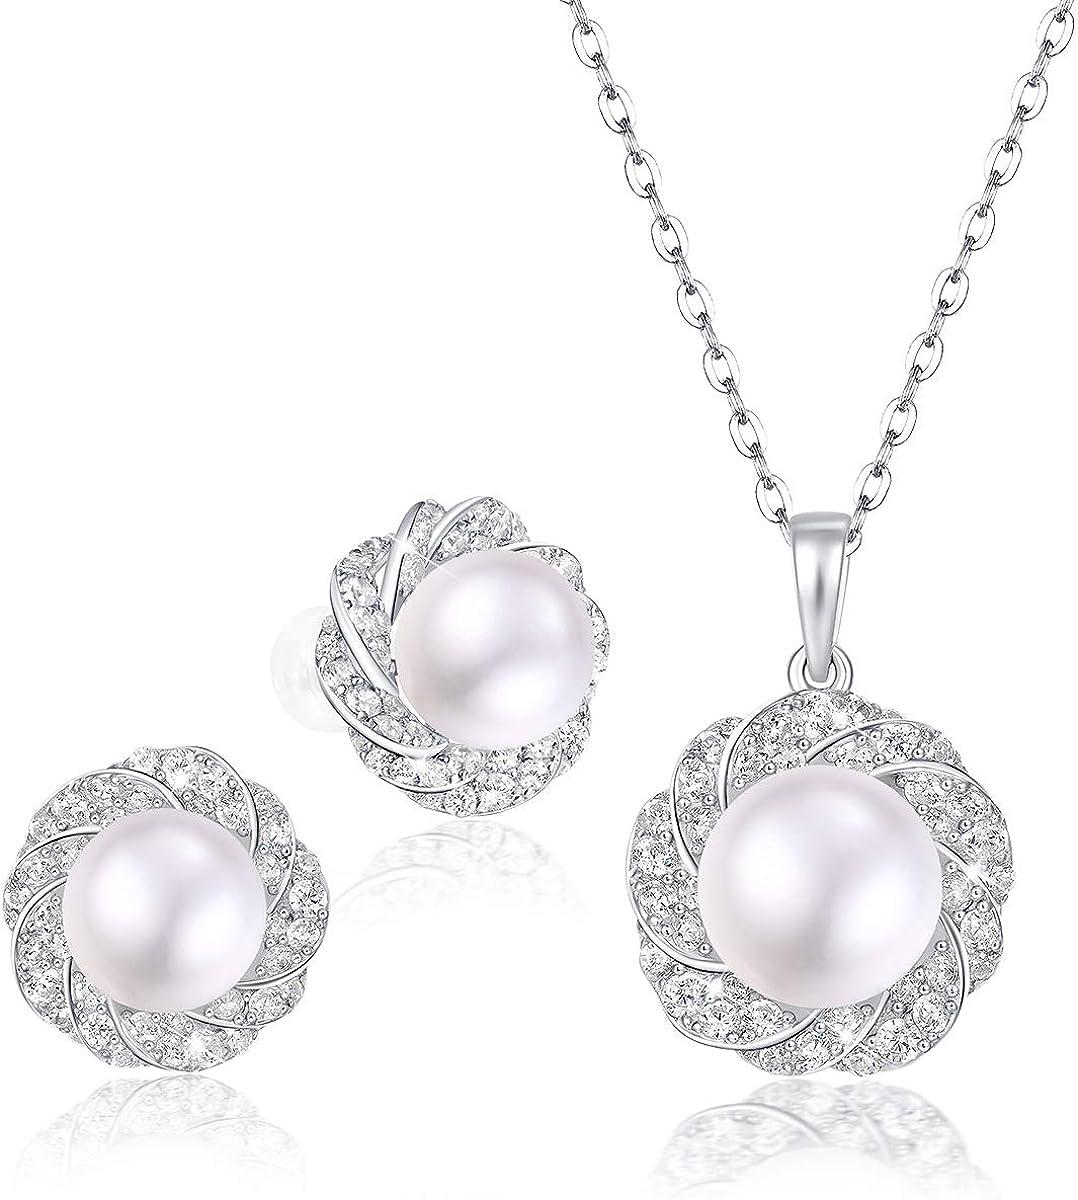 women/'s pendant silver pendant pendant for women/'s silver pendant for women/'s pearl pendant